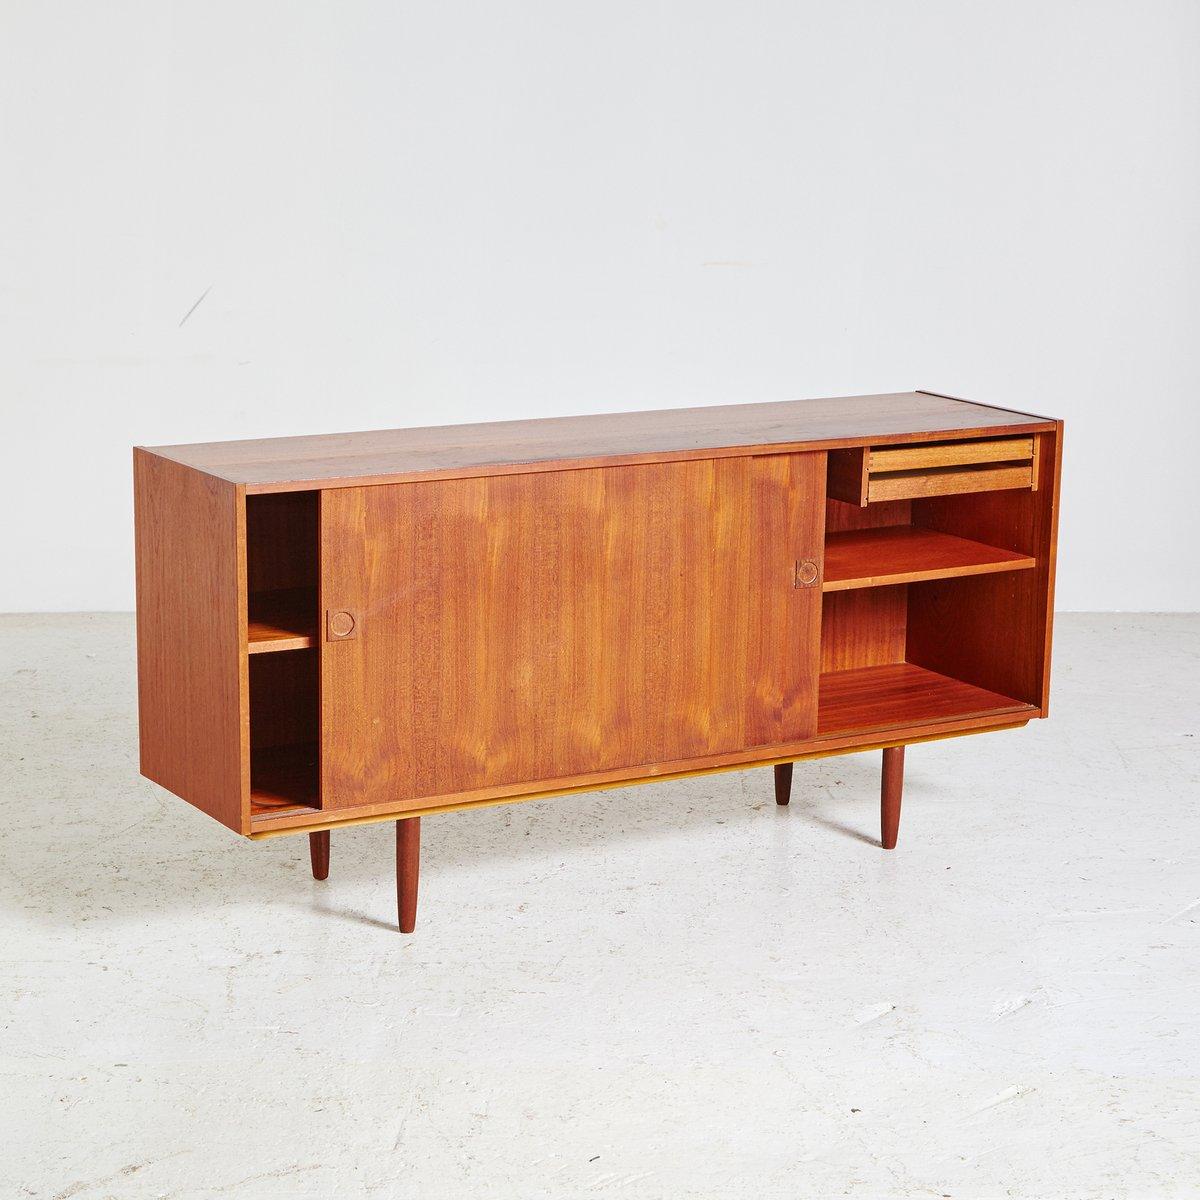 Kleines d nisches mid century sideboard 1960er bei pamono for Sideboard 4 meter lang